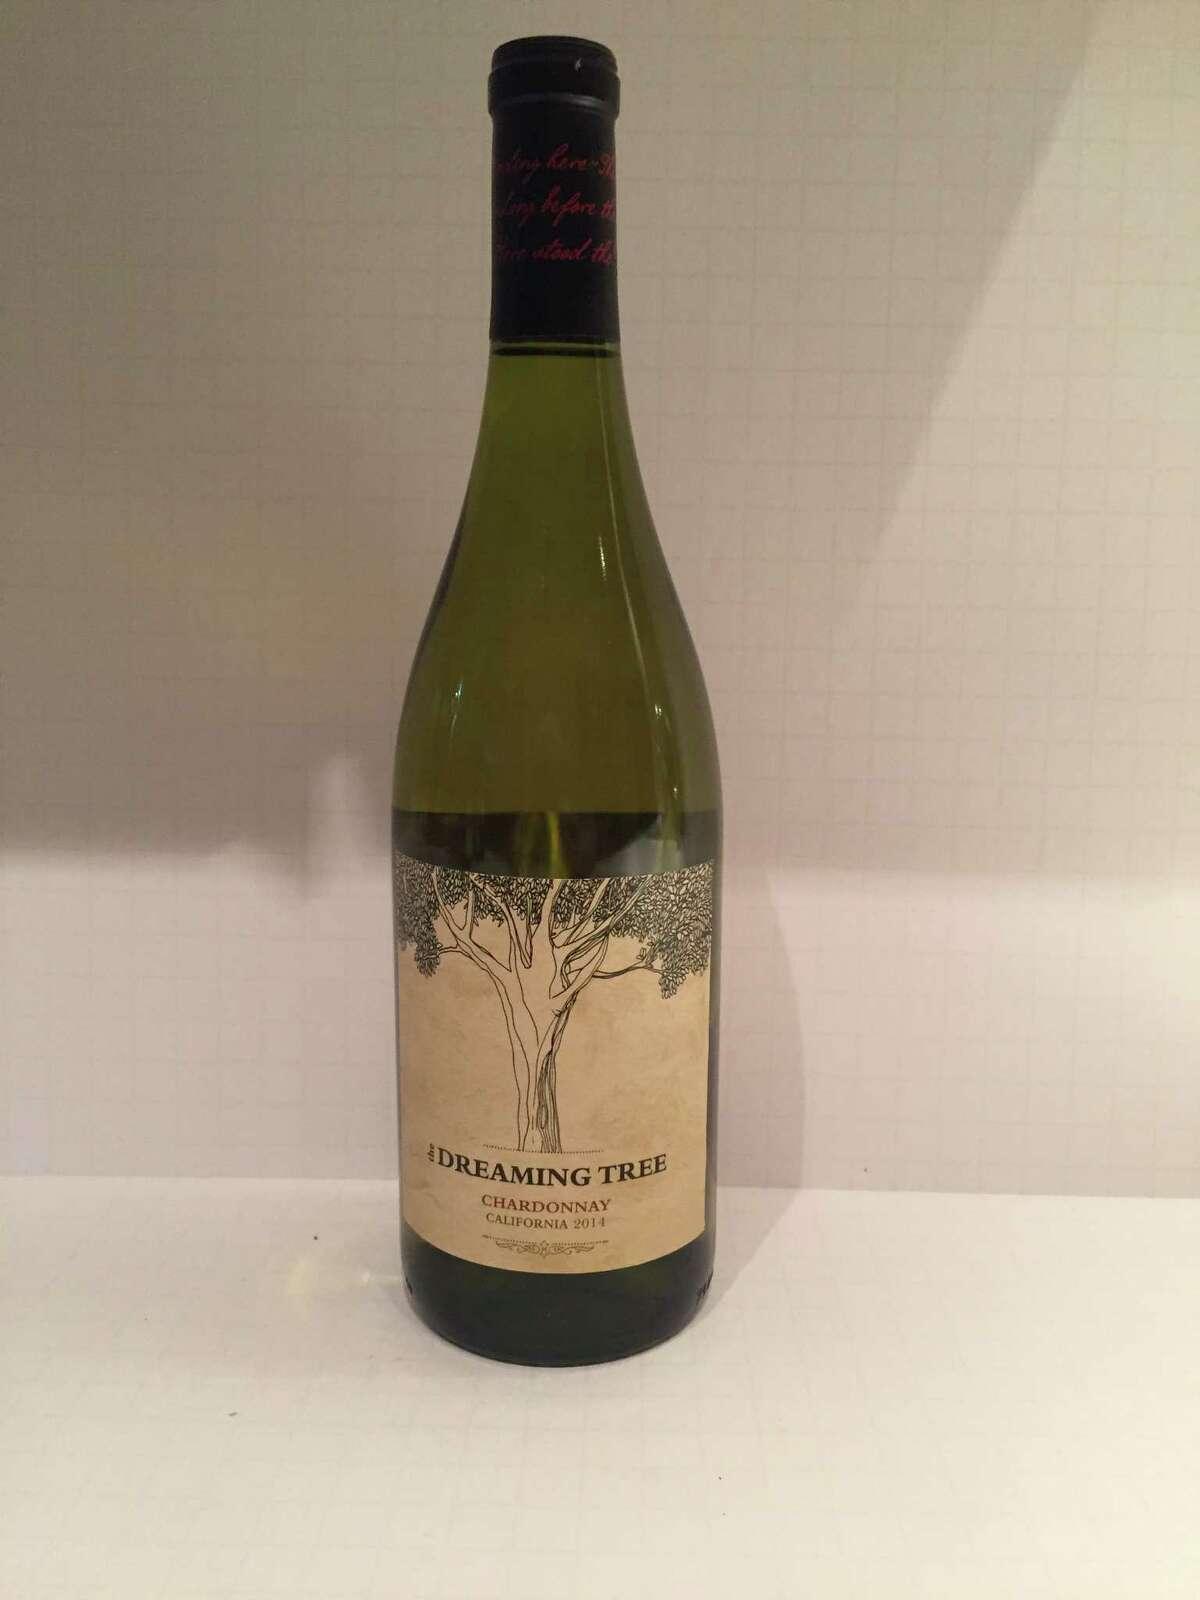 2014 The Dreaming Tree Chardonnay